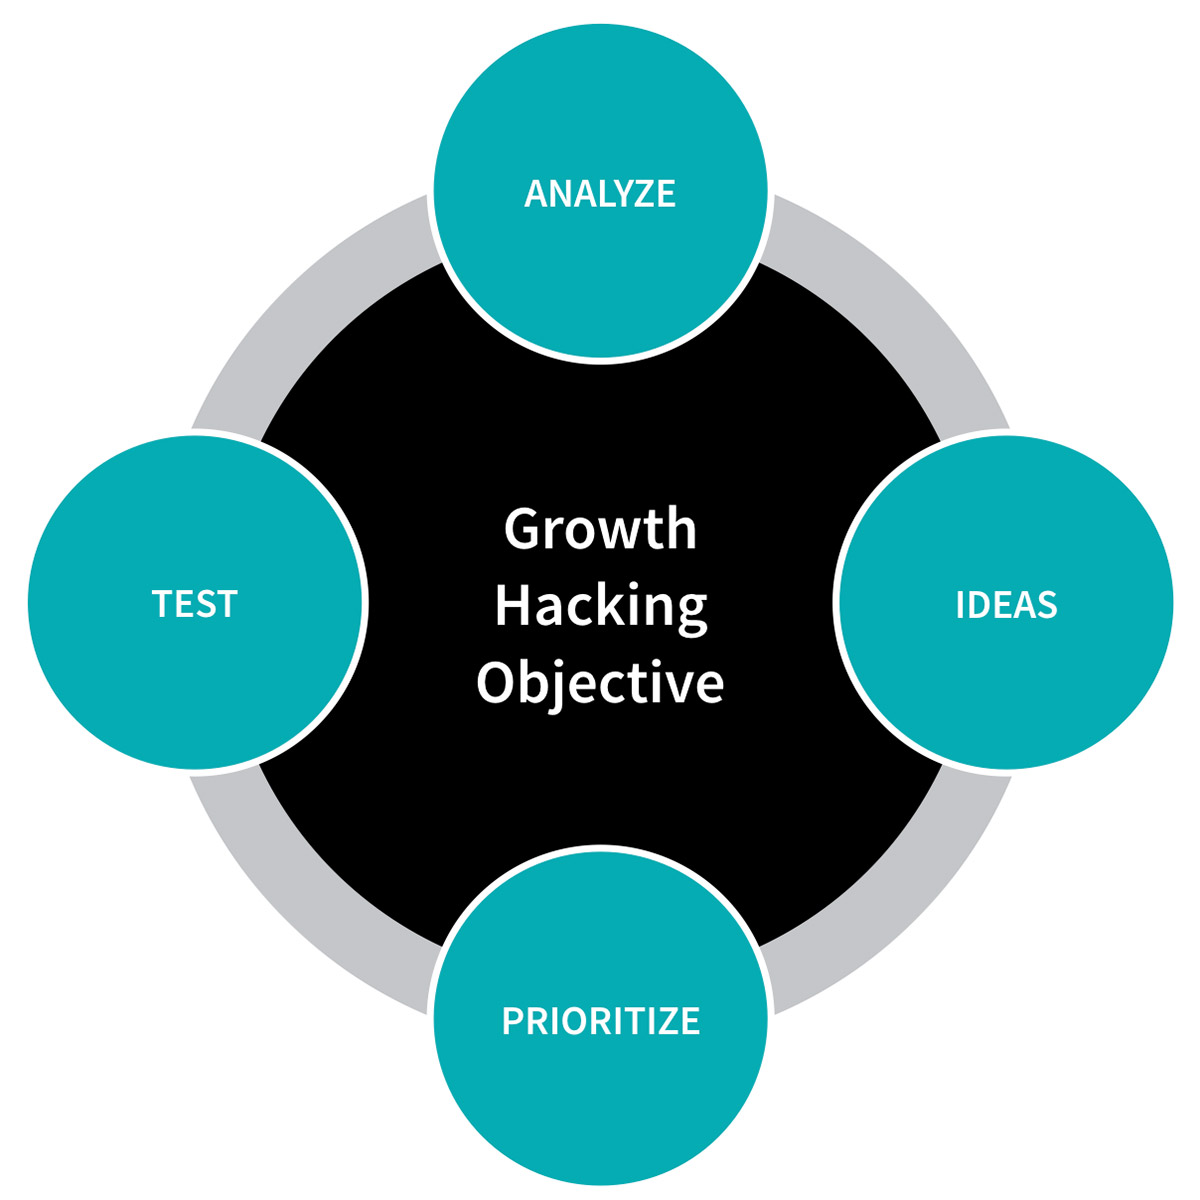 italian Growth hacking agency